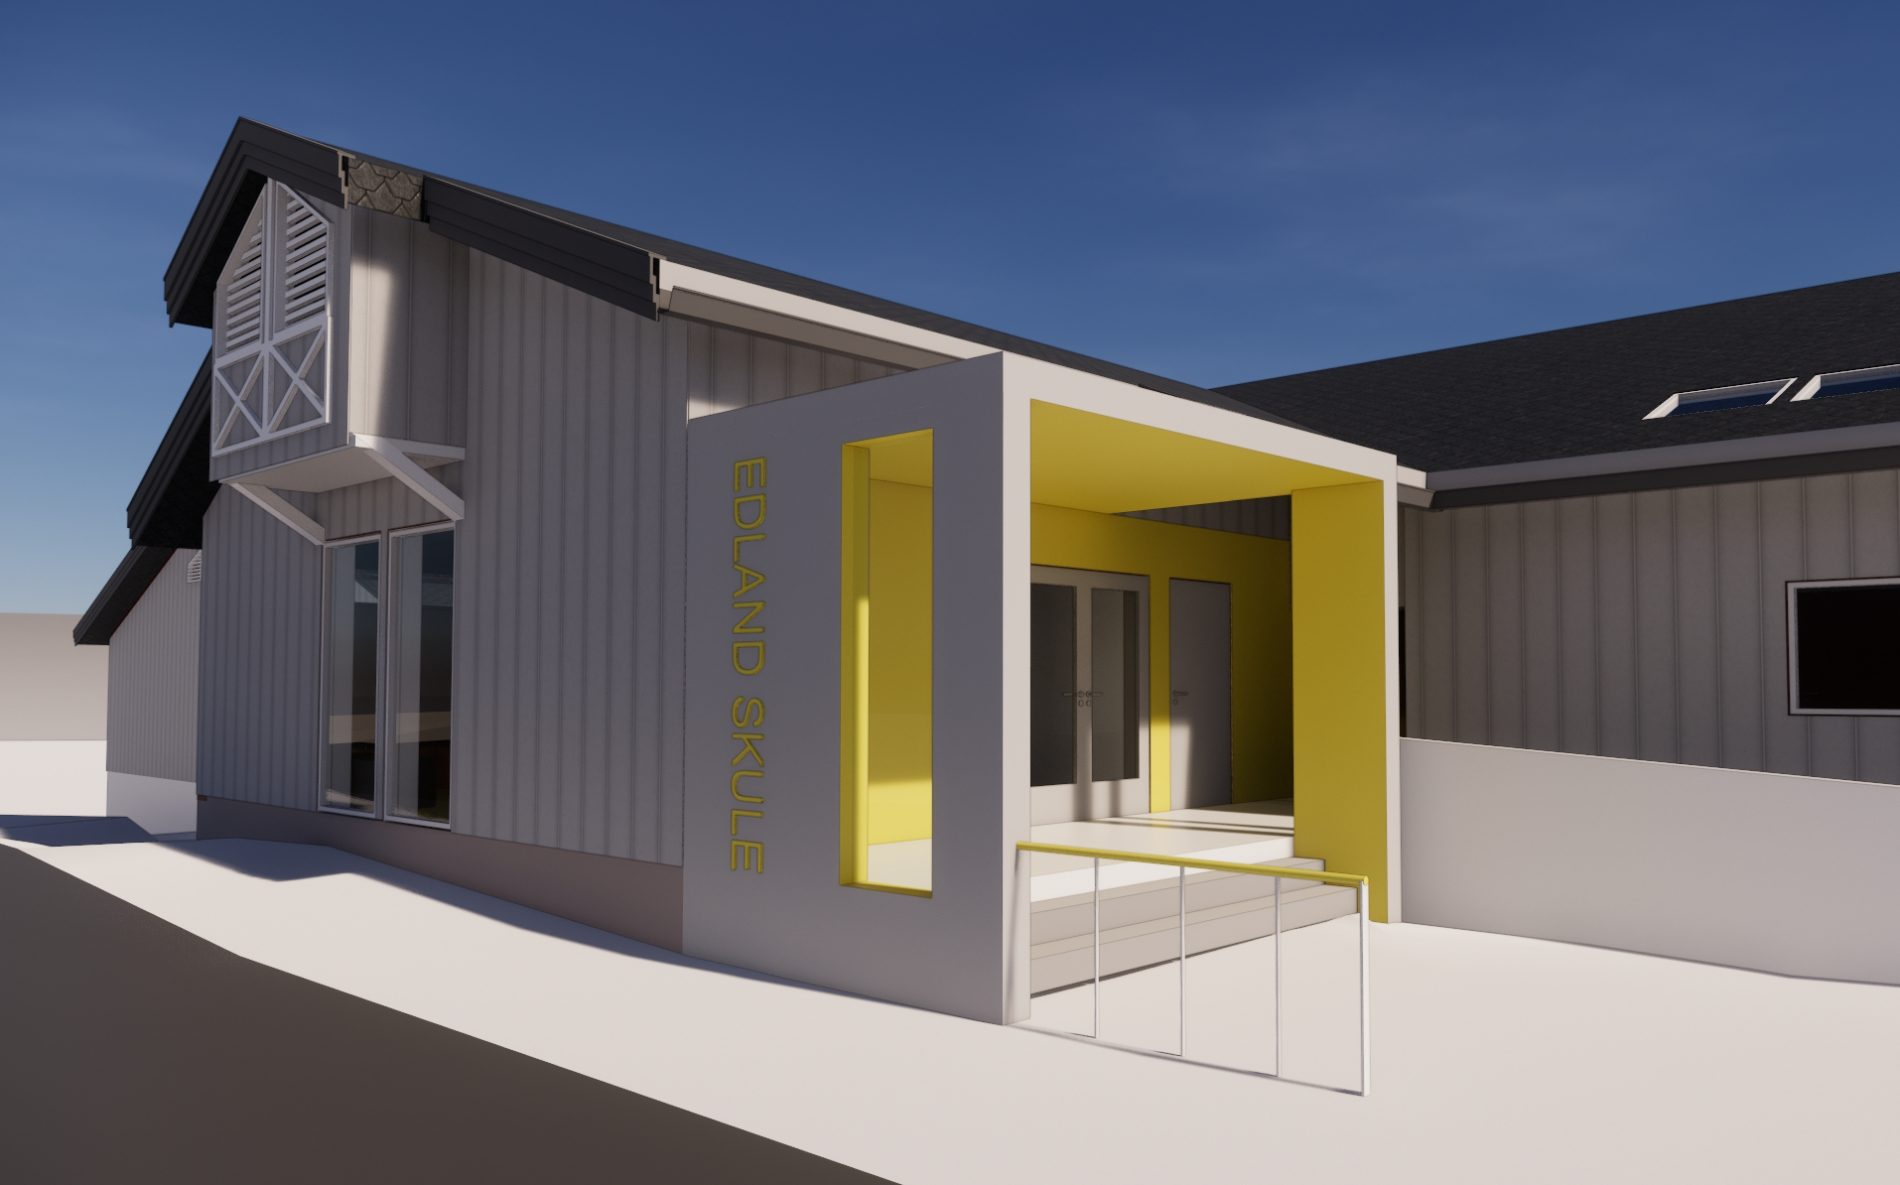 Edland Skule - Rehabilitering - Point Design